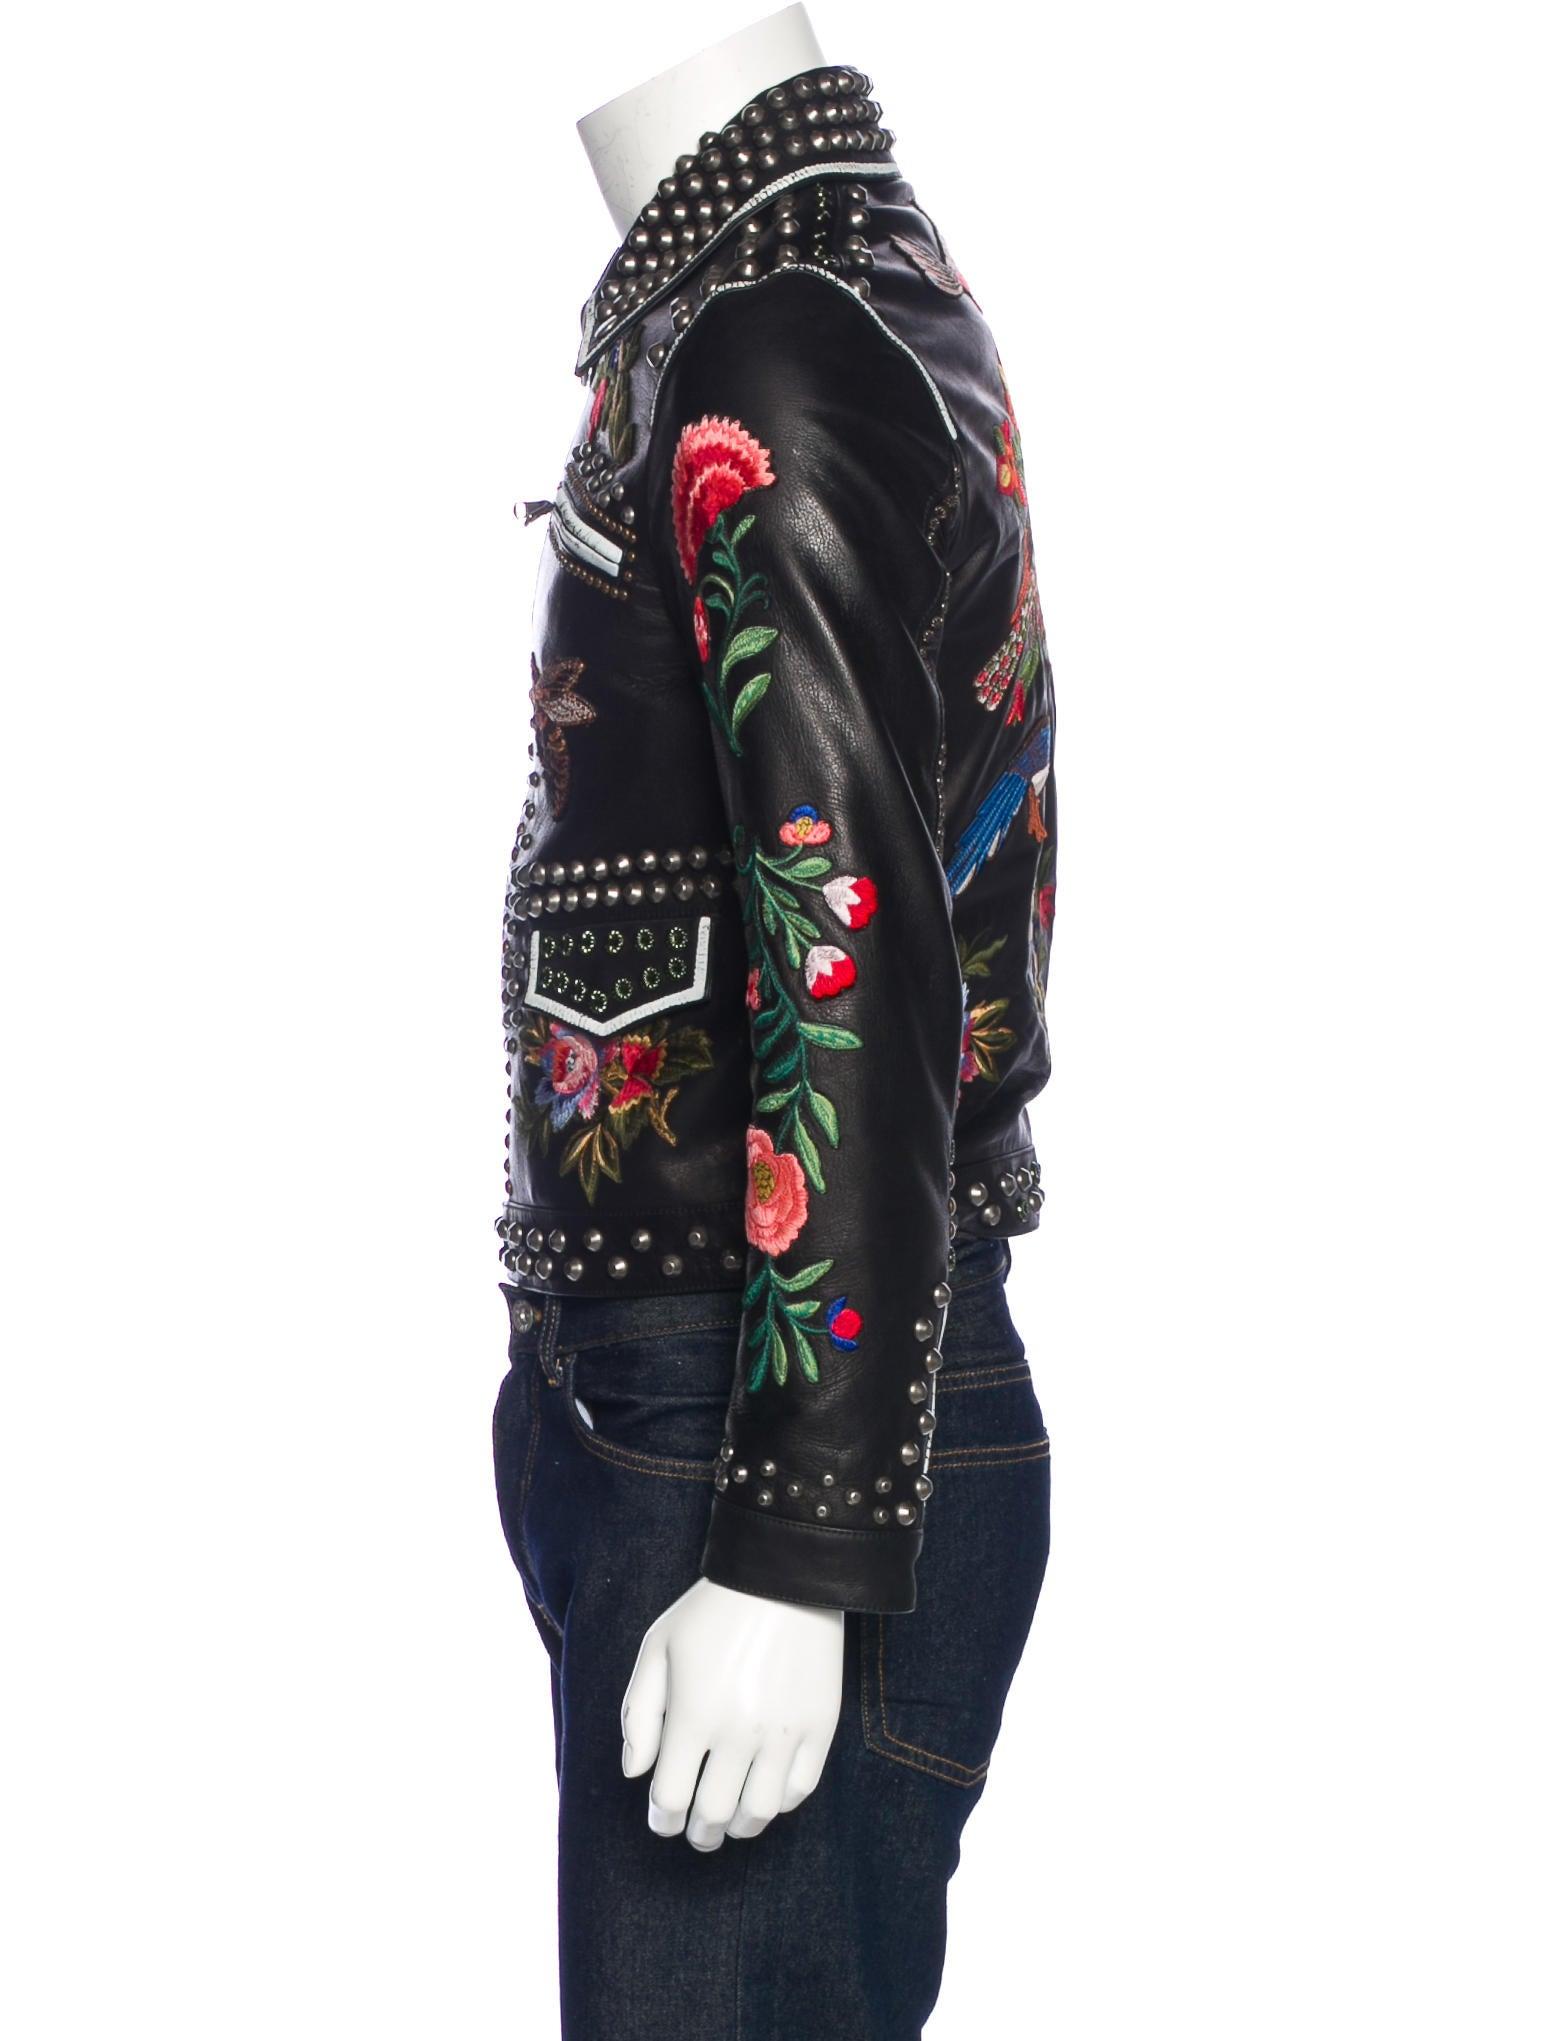 Gucci Bird-Embroidered Leather Baseball Jacket - Coats - 505700101